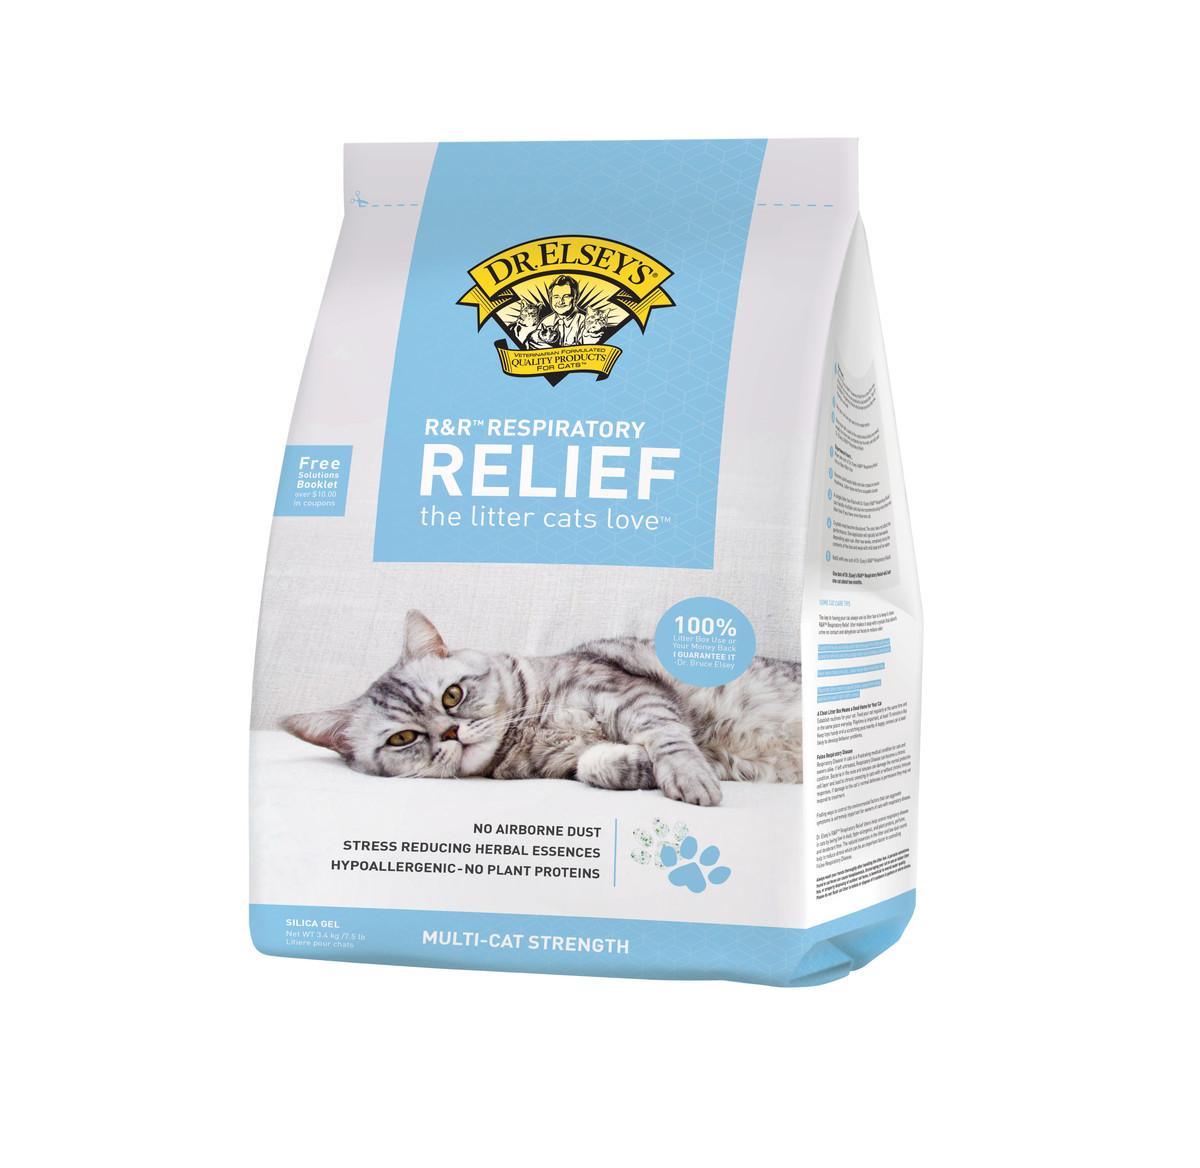 R&R™ Respiratory Relief Silica Gel Litter